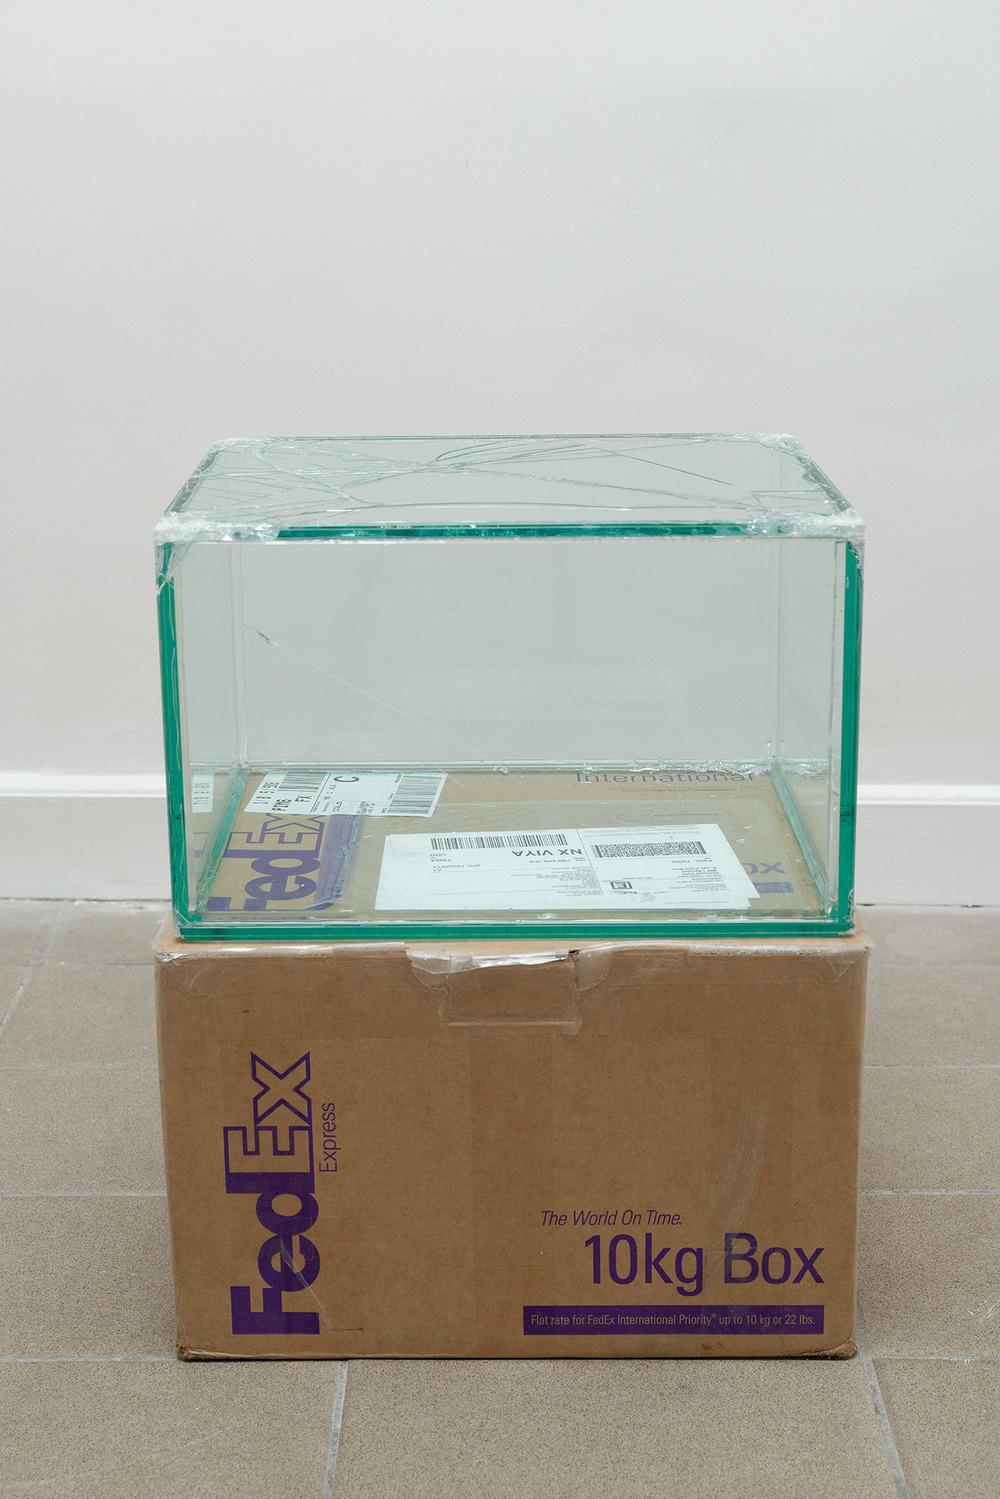 FedEx 10kg Box 2006 FedEx 149801 REV 9/06 MP, International Priority, Los Angeles-Paris trk#796906988159, October 14-16, 2013    2013–   Laminated glass, FedEx shipping box, accrued FedEx shipping and tracking labels, silicone, metal, tape  10 1/2 x 16 1/4 x 13 1/4 inches   8 rue Saint-Bon, 2013